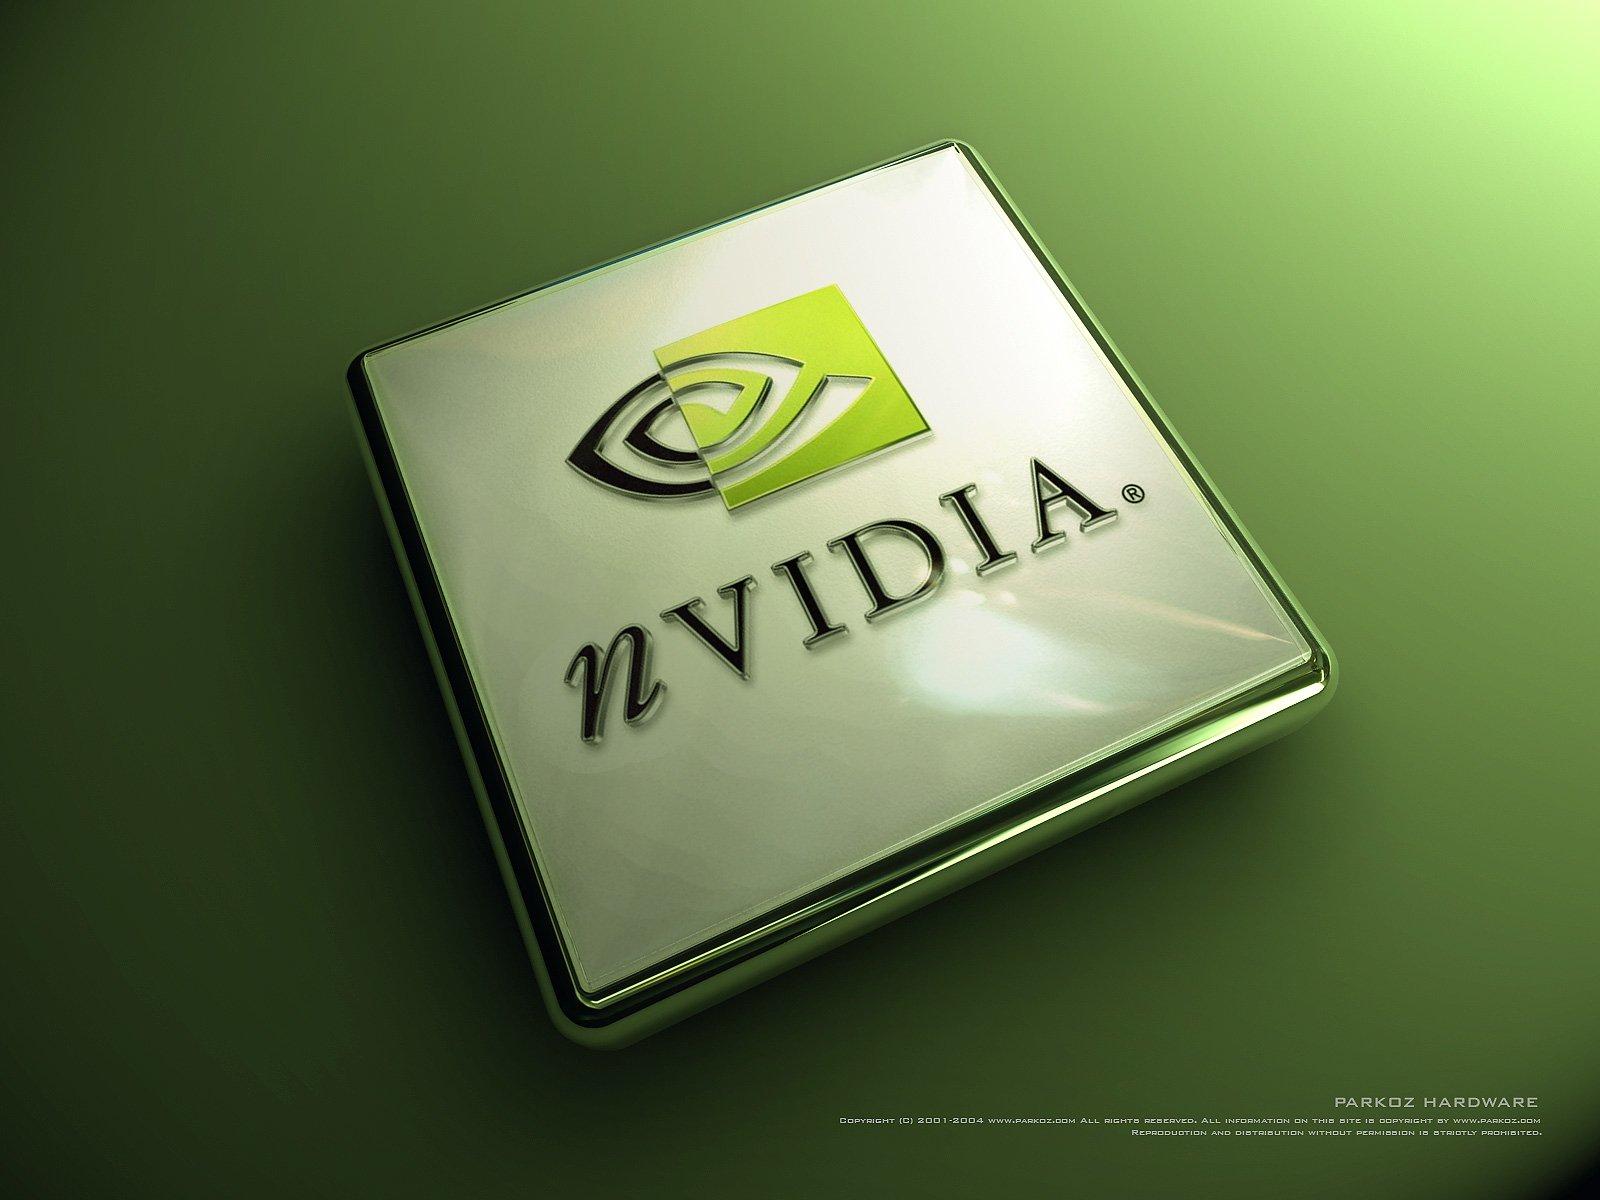 nVidia HD desktop wallpaper : Widescreen : High Definition : Mobile